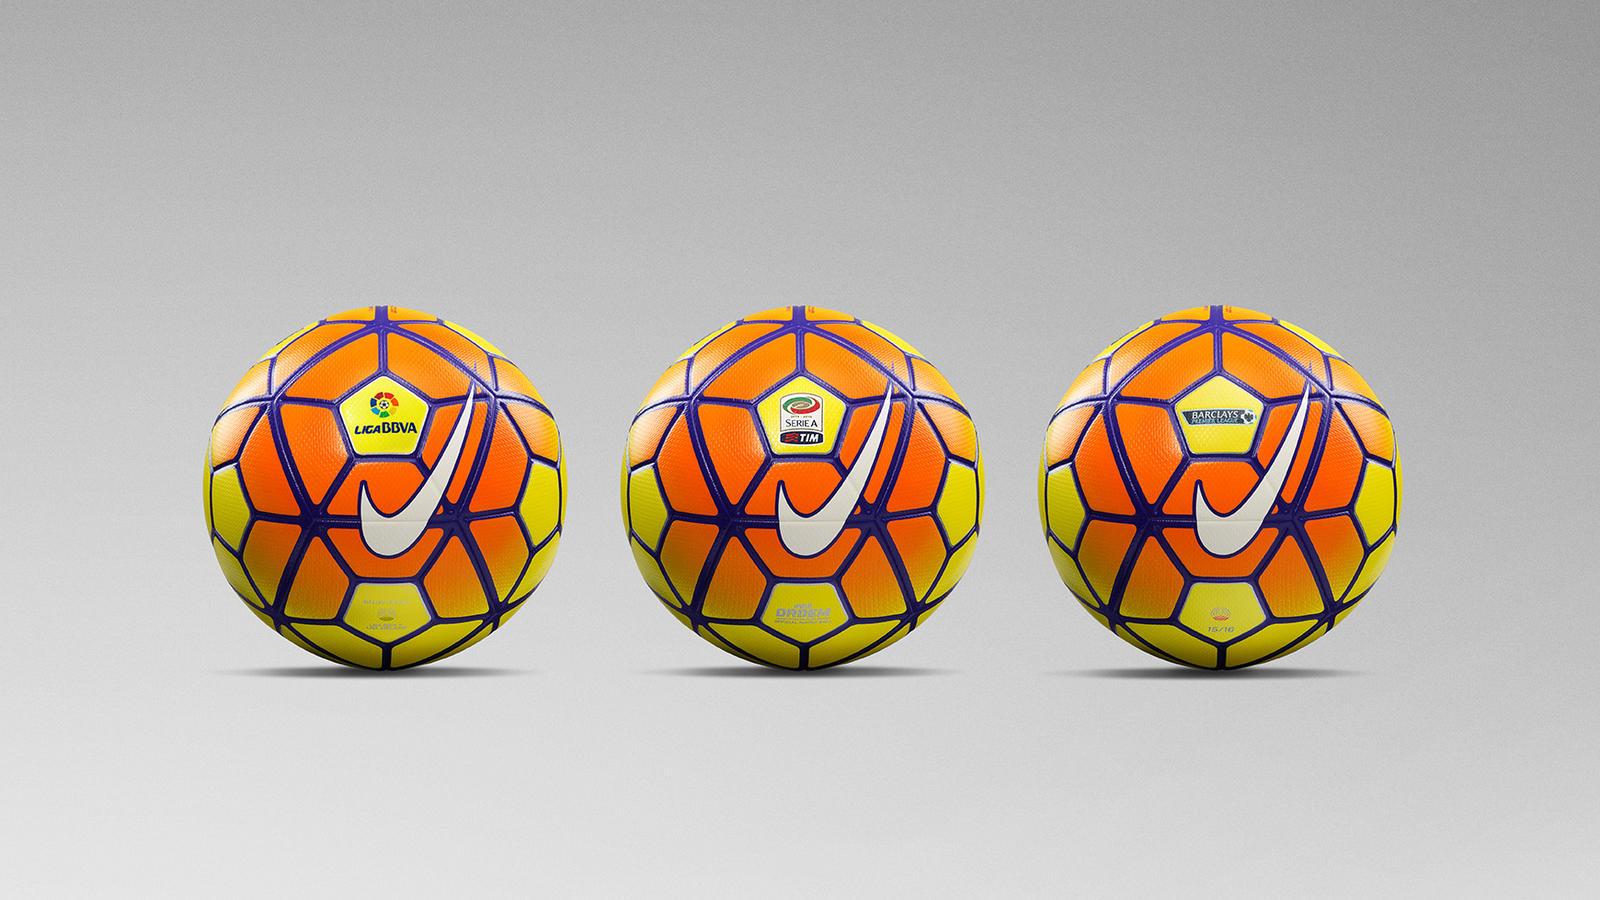 HO15 FB Ordem HiVis Ball Group LFP SerieA Barclay V2.  HO15 FB Ordem HiVis Ball Group LFP SerieA Barclay V2 505ffade504b